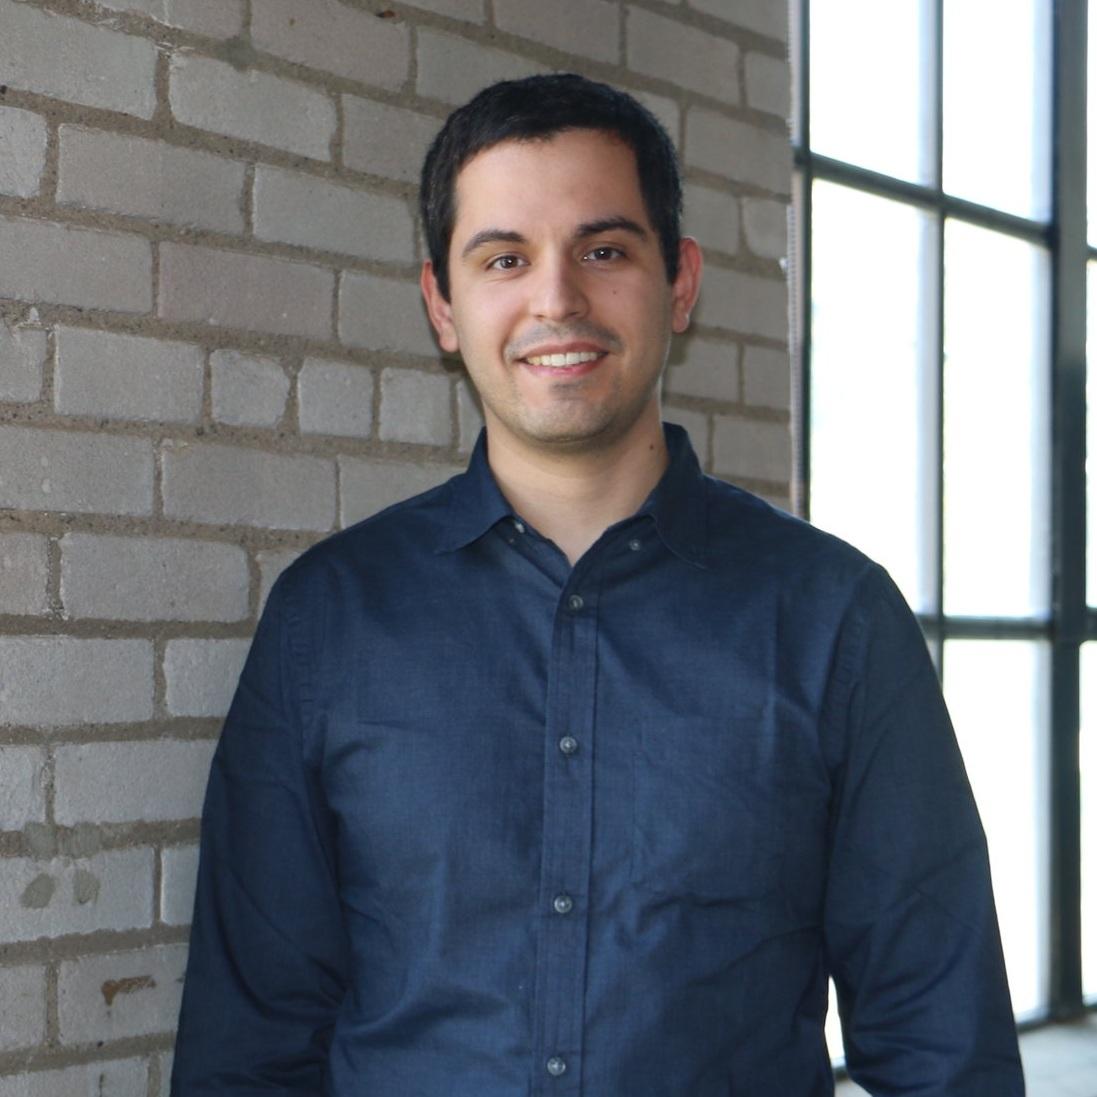 James Bouwens - Software Developer